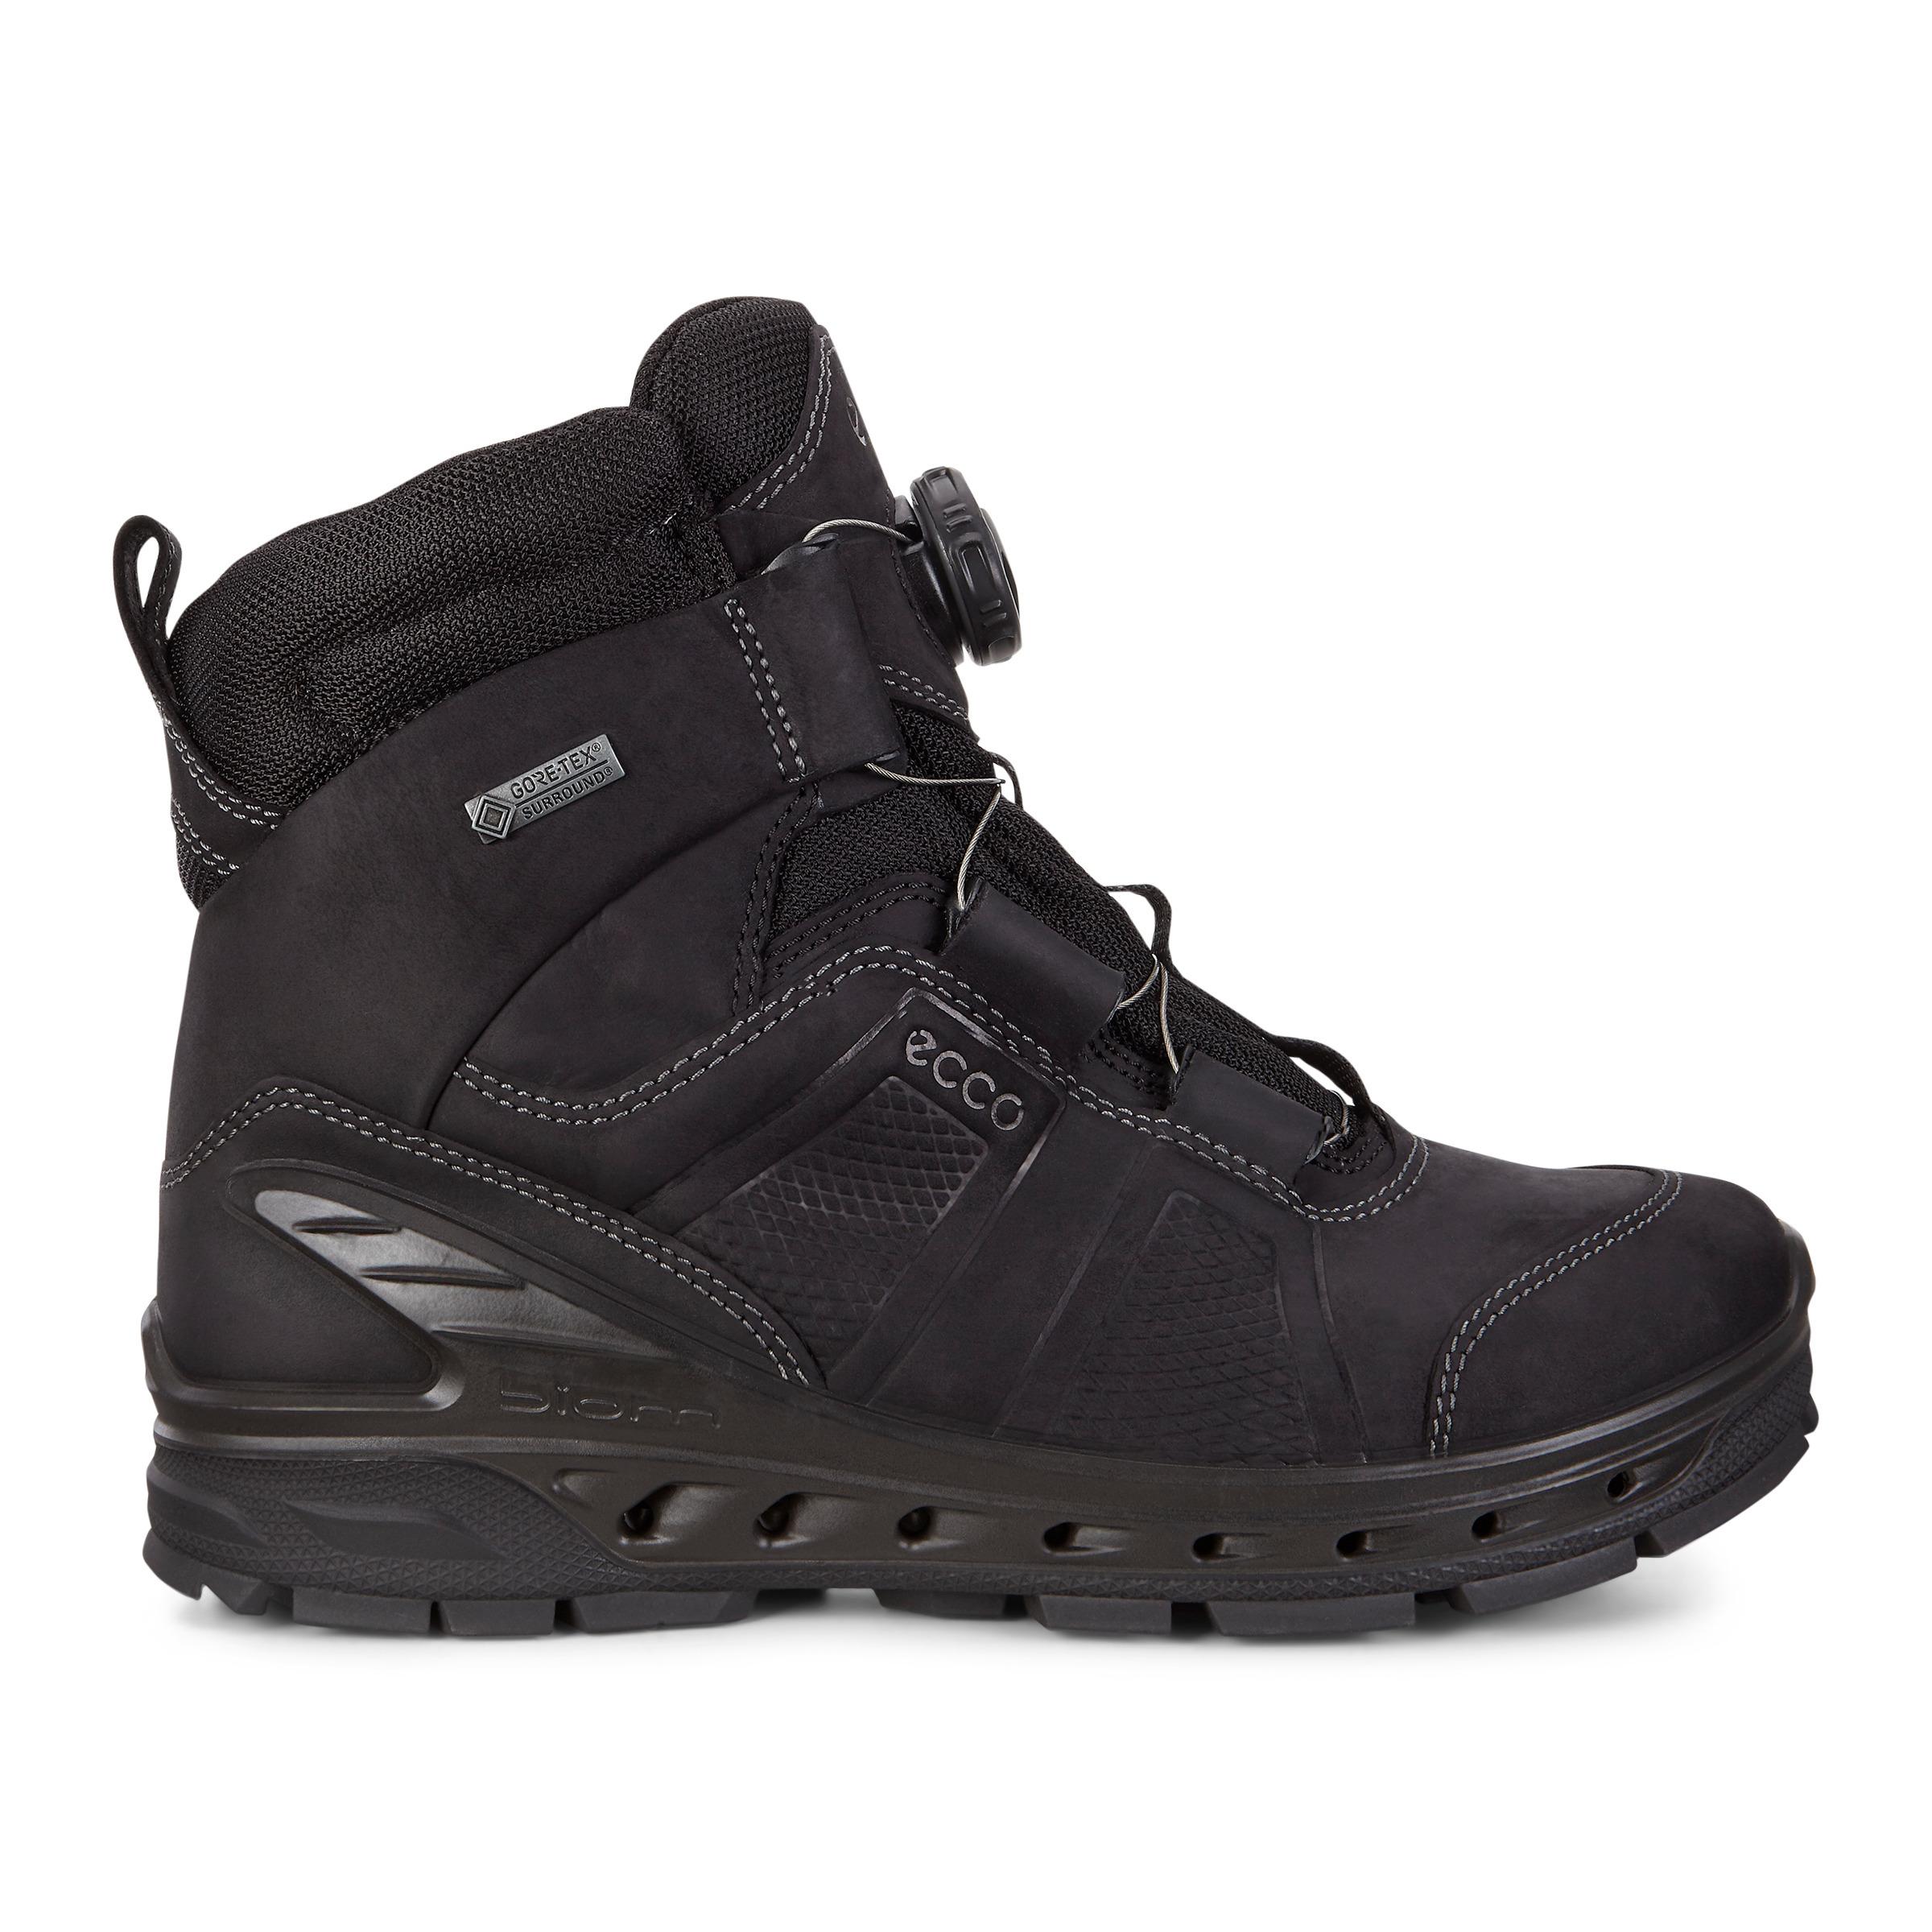 Ecco Biom Venture TR GTX Boot | Products | Boots, Waterproof